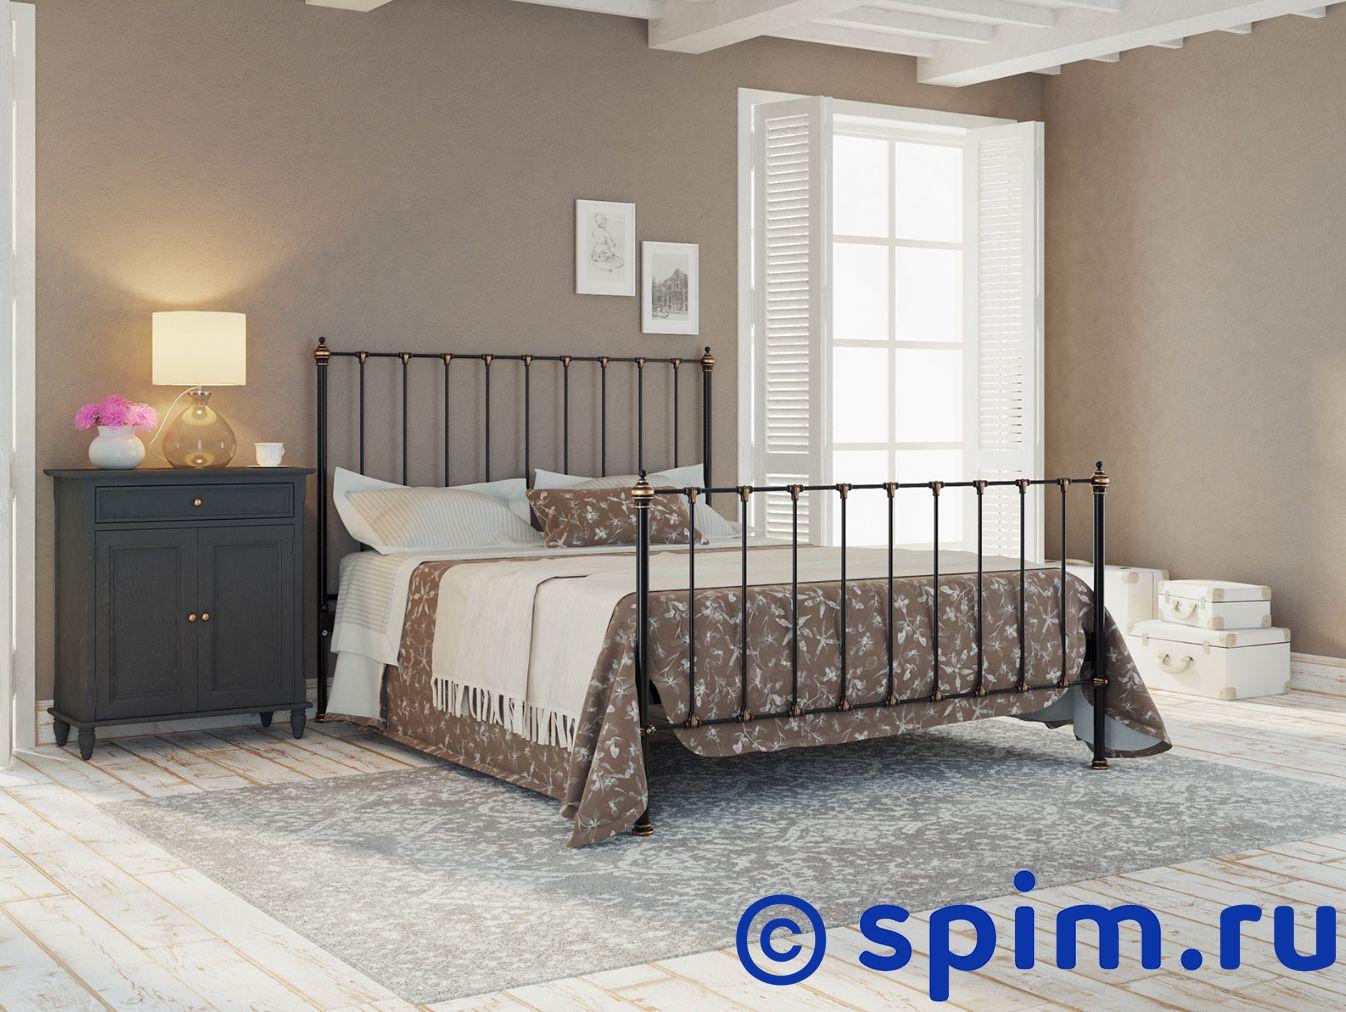 Кровать Originals by Dreamline Paris (1 спинка) 180х190 см матрас dreamline springless soft slim 90х195 см